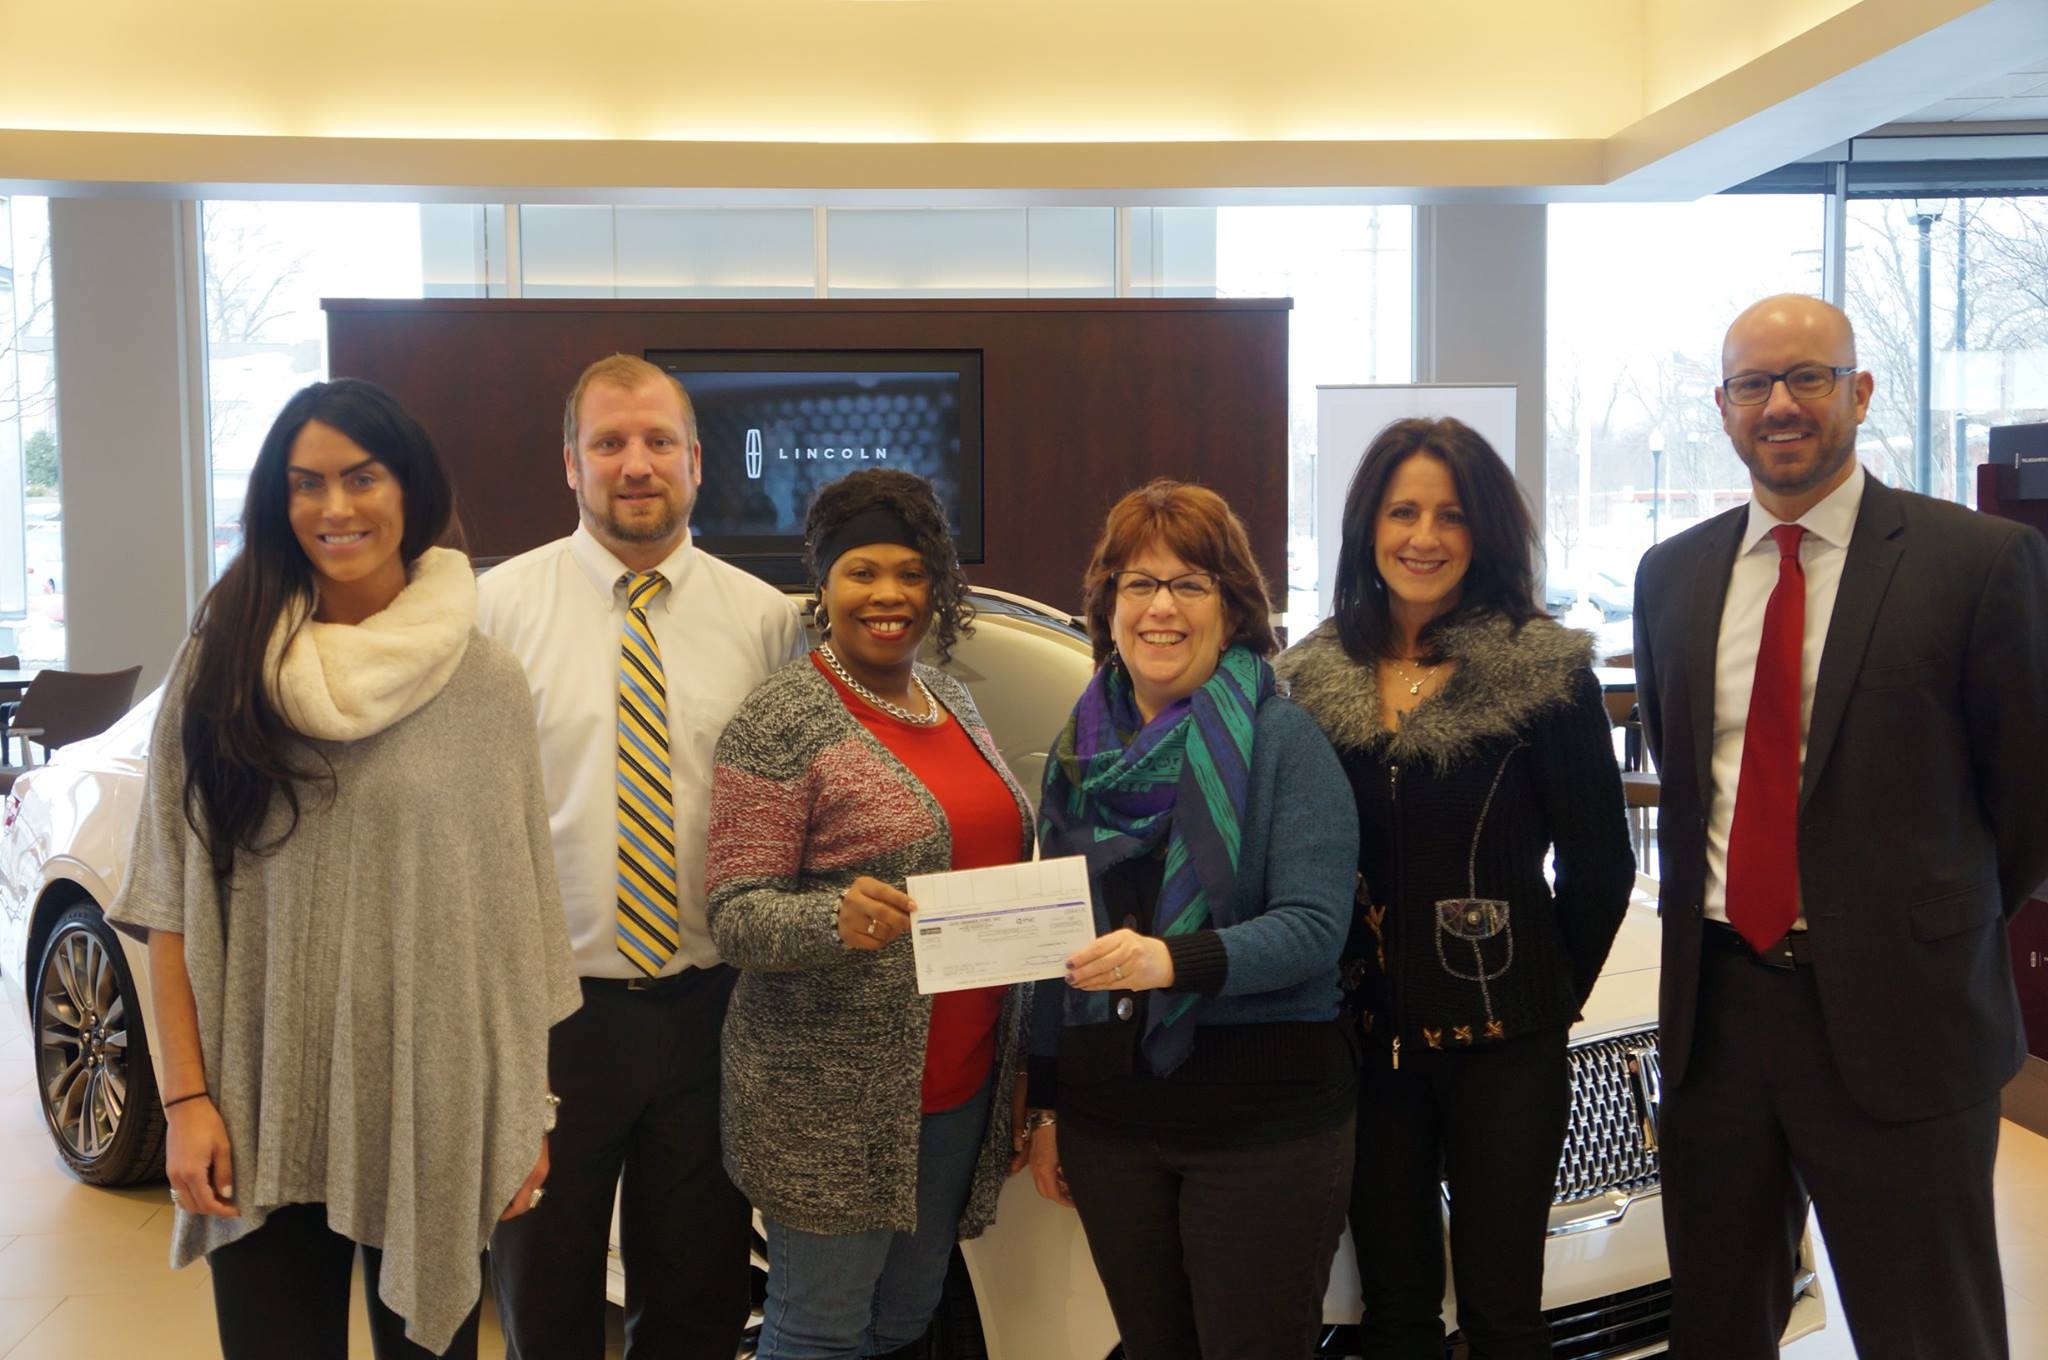 Jack Demmer Lincoln Philanthropy Benefits Area Charities